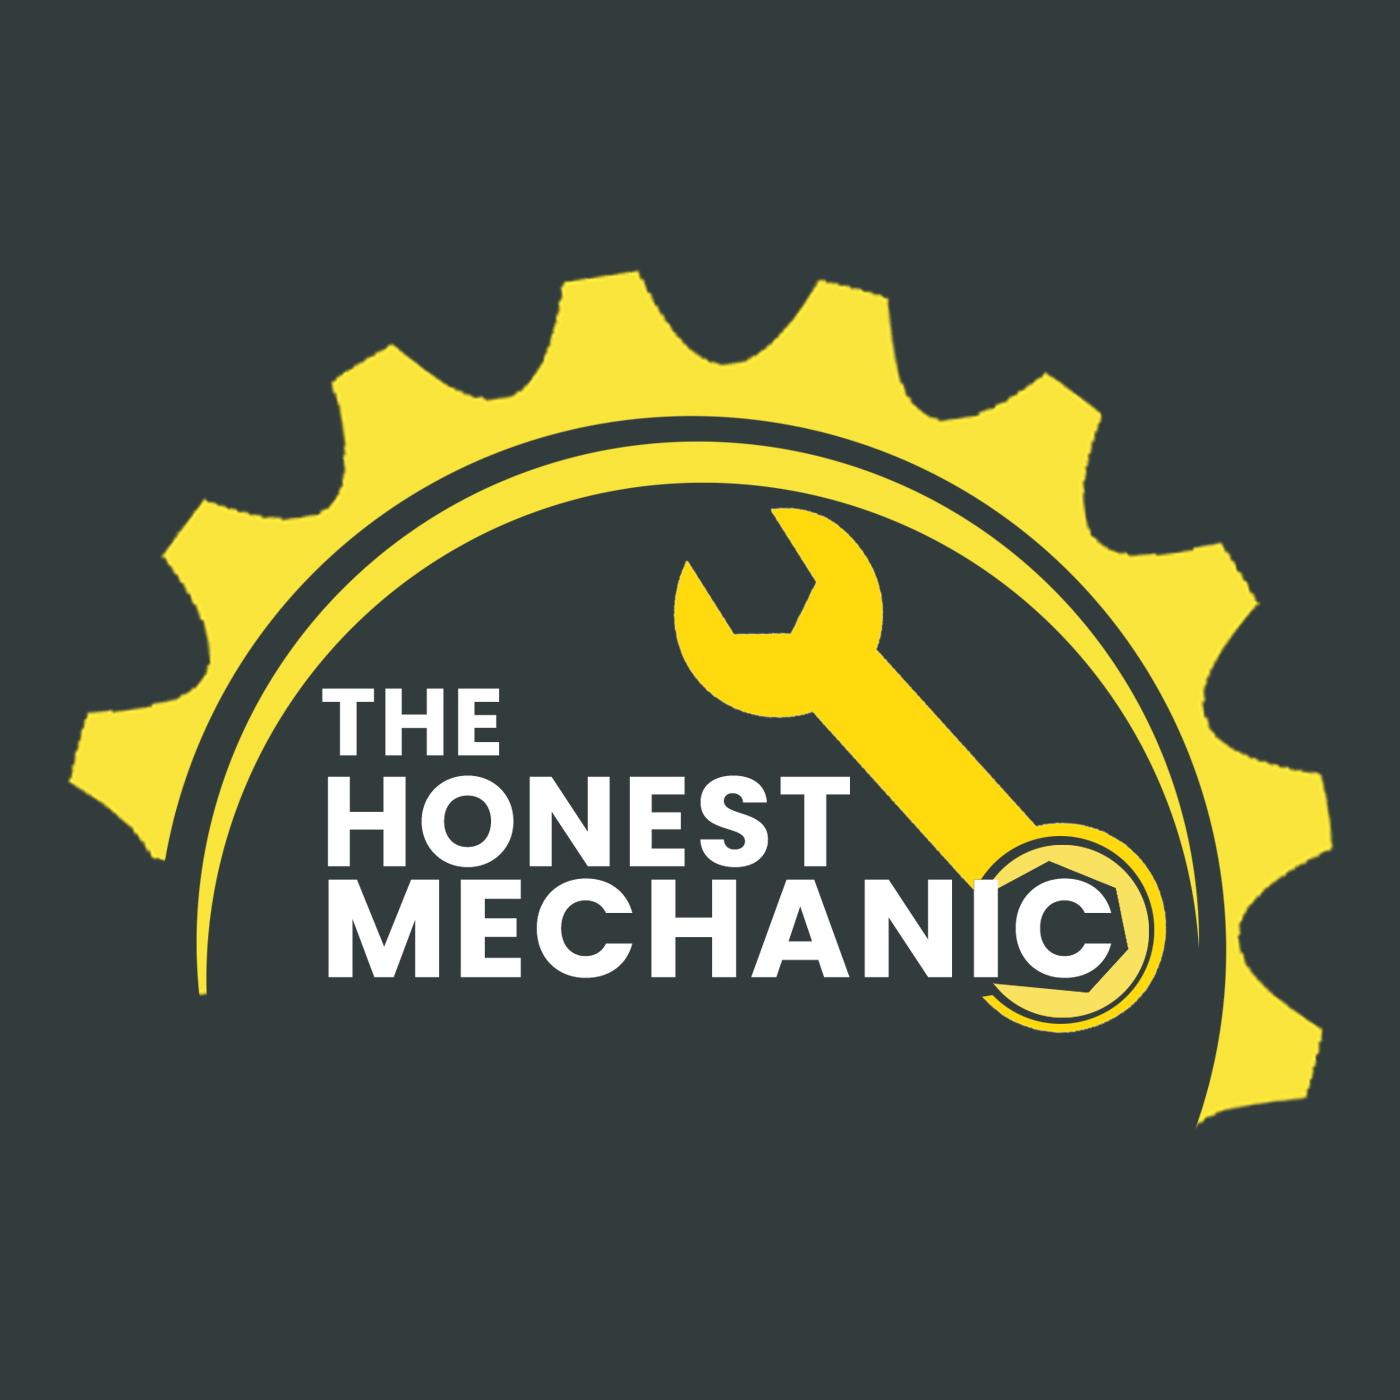 The Honest Mechanic Podcast Podcast - Listen, Reviews